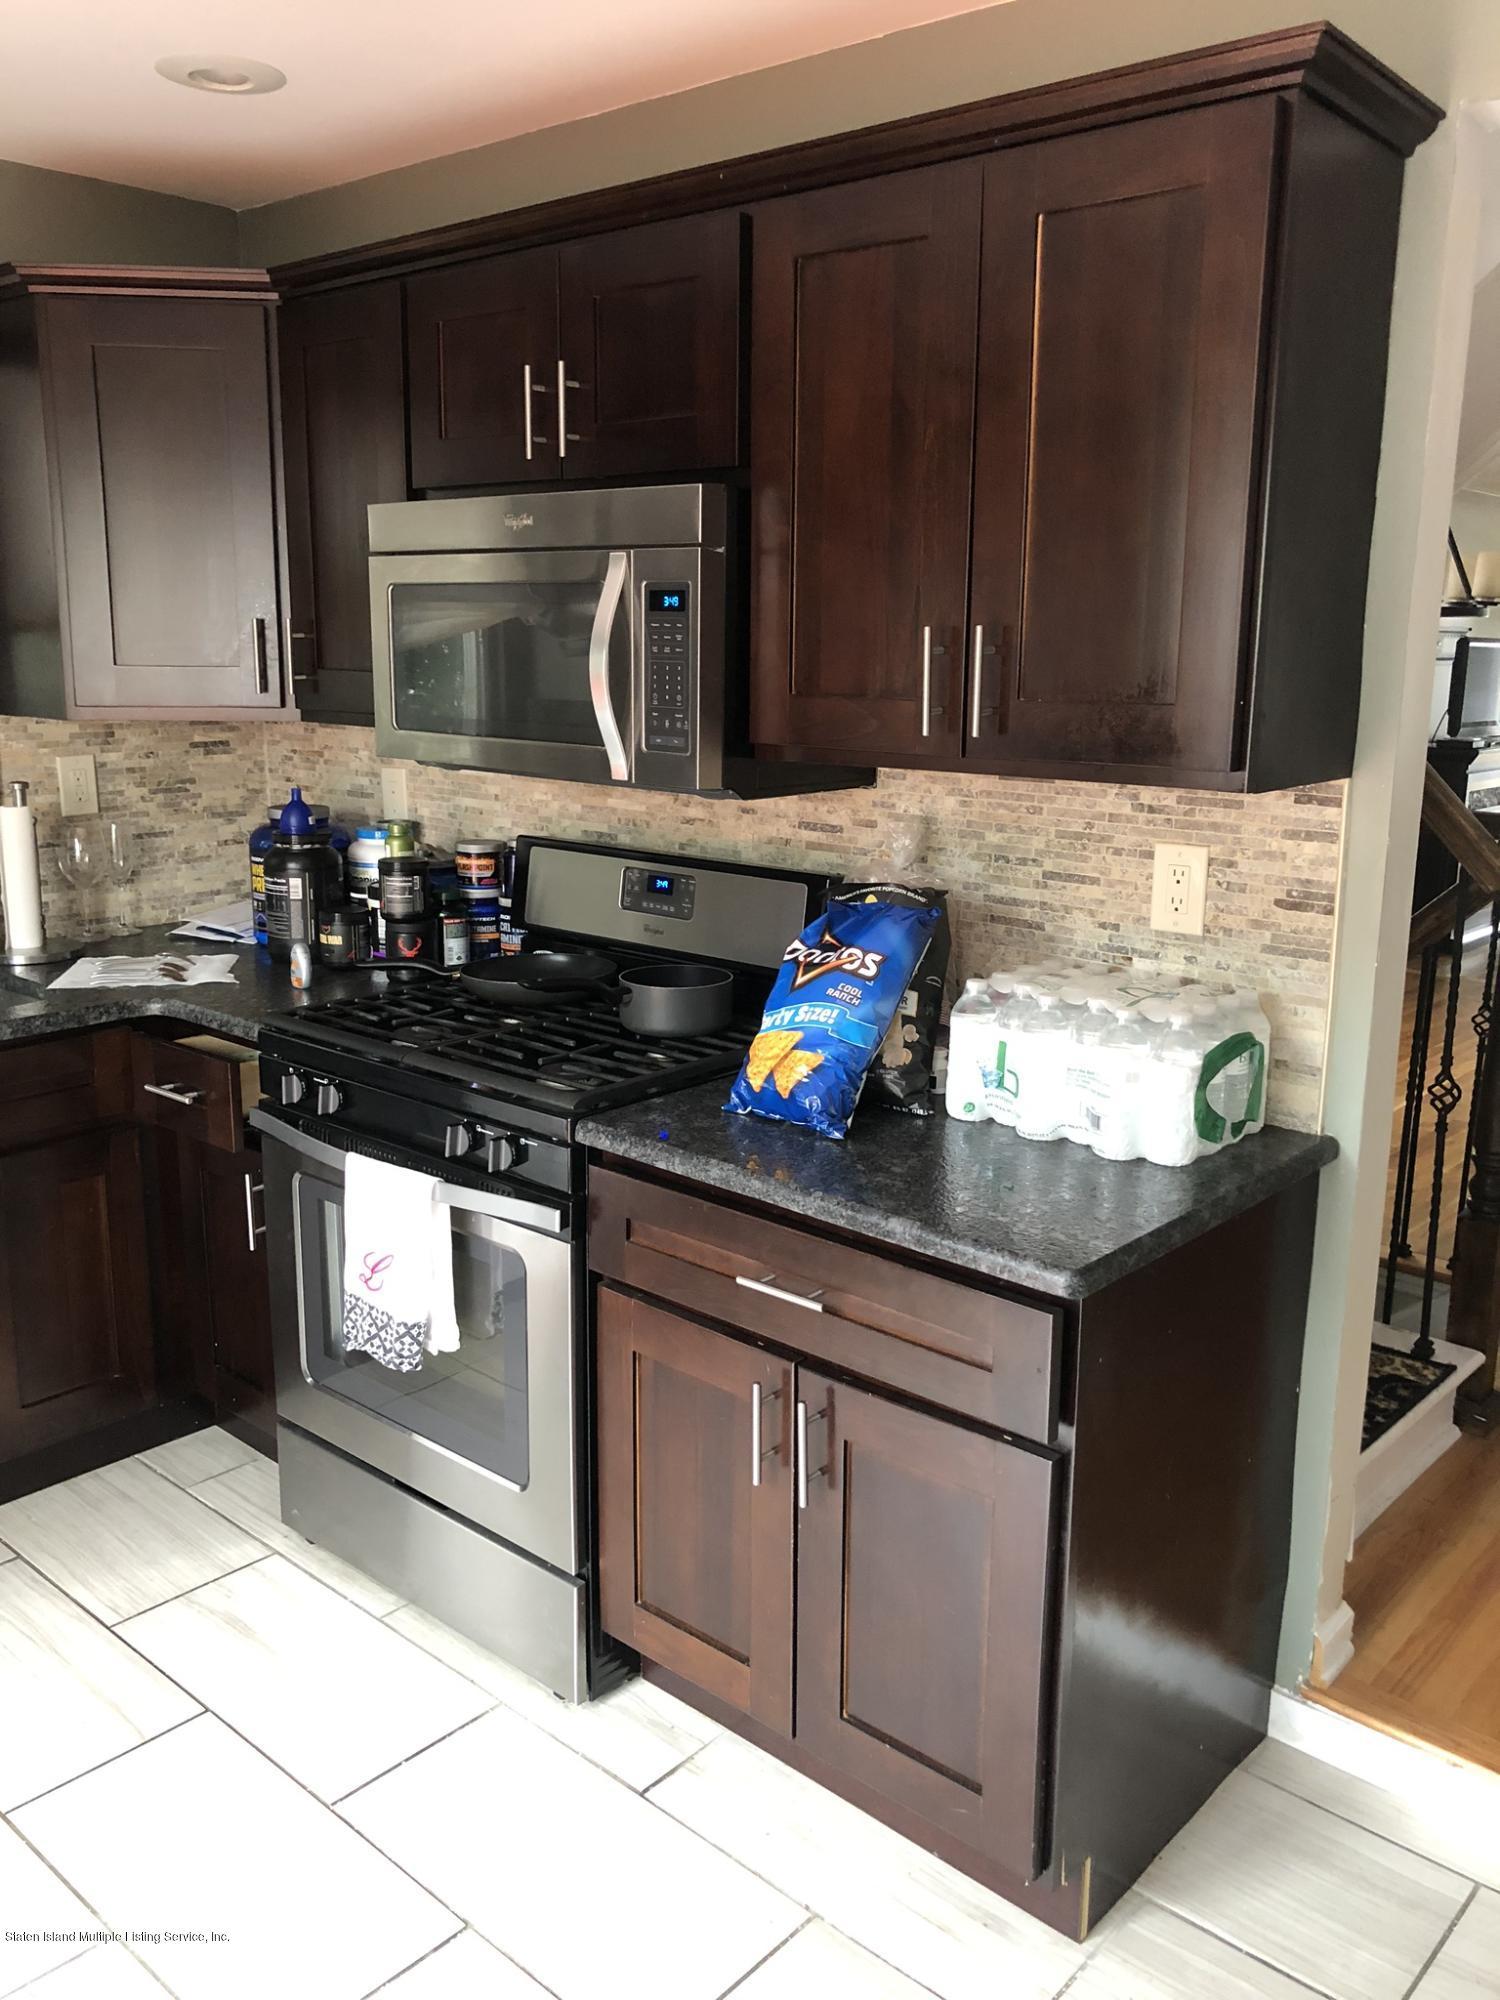 Single Family - Semi-Attached 59 Cranford Street  Staten Island, NY 10308, MLS-1128460-16